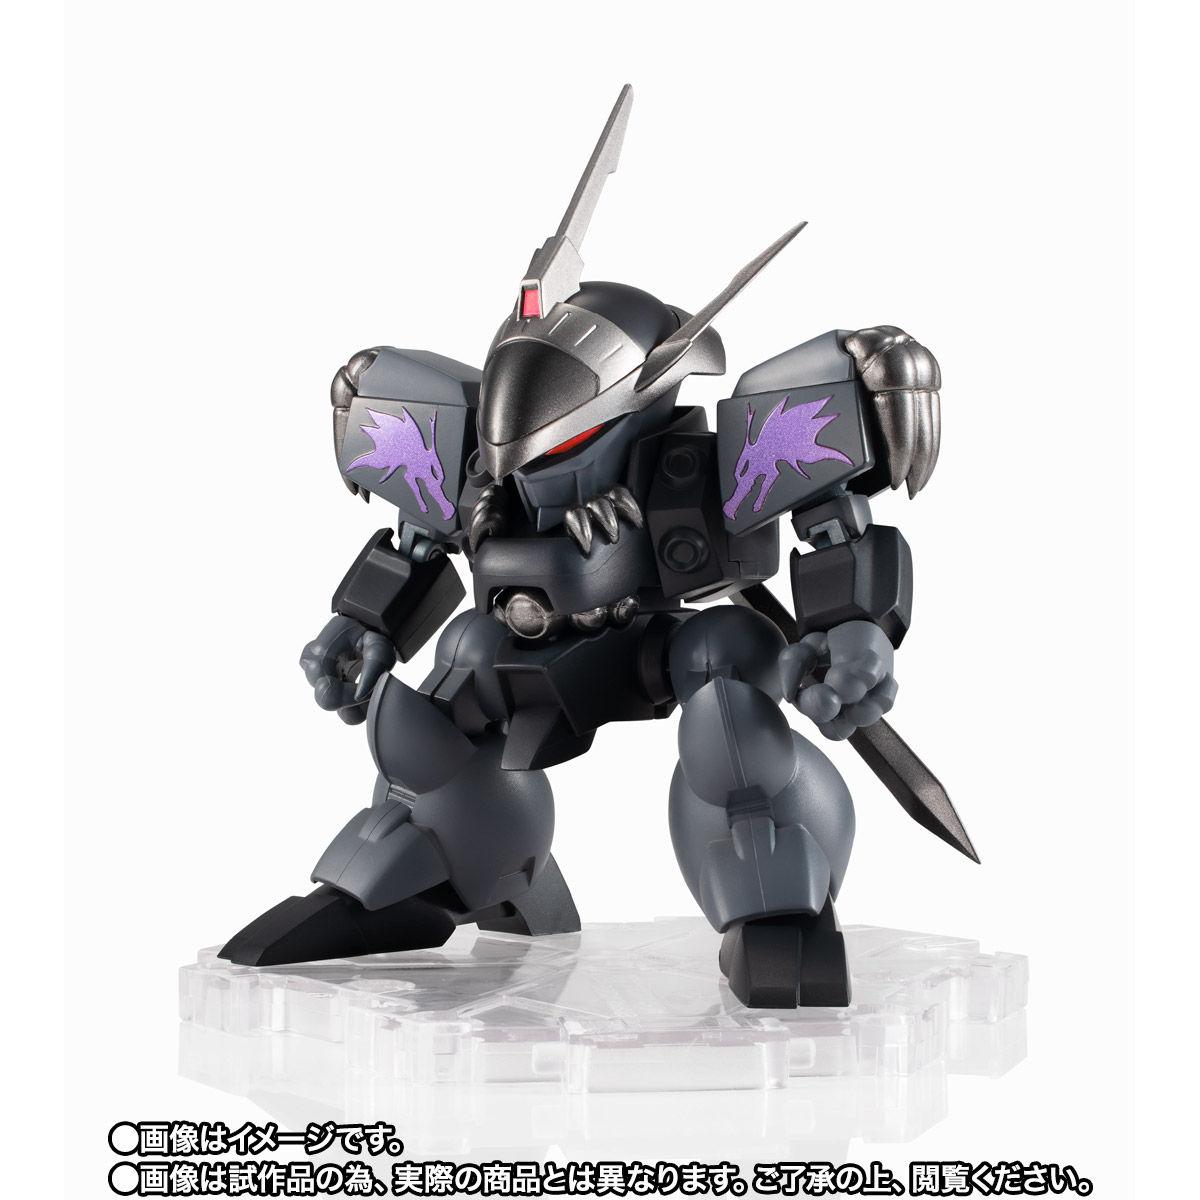 NXEDGE STYLE[MASHIN UNIT]『龍神丸-黒闇-』魔神英雄伝ワタル 可動フィギュア-003